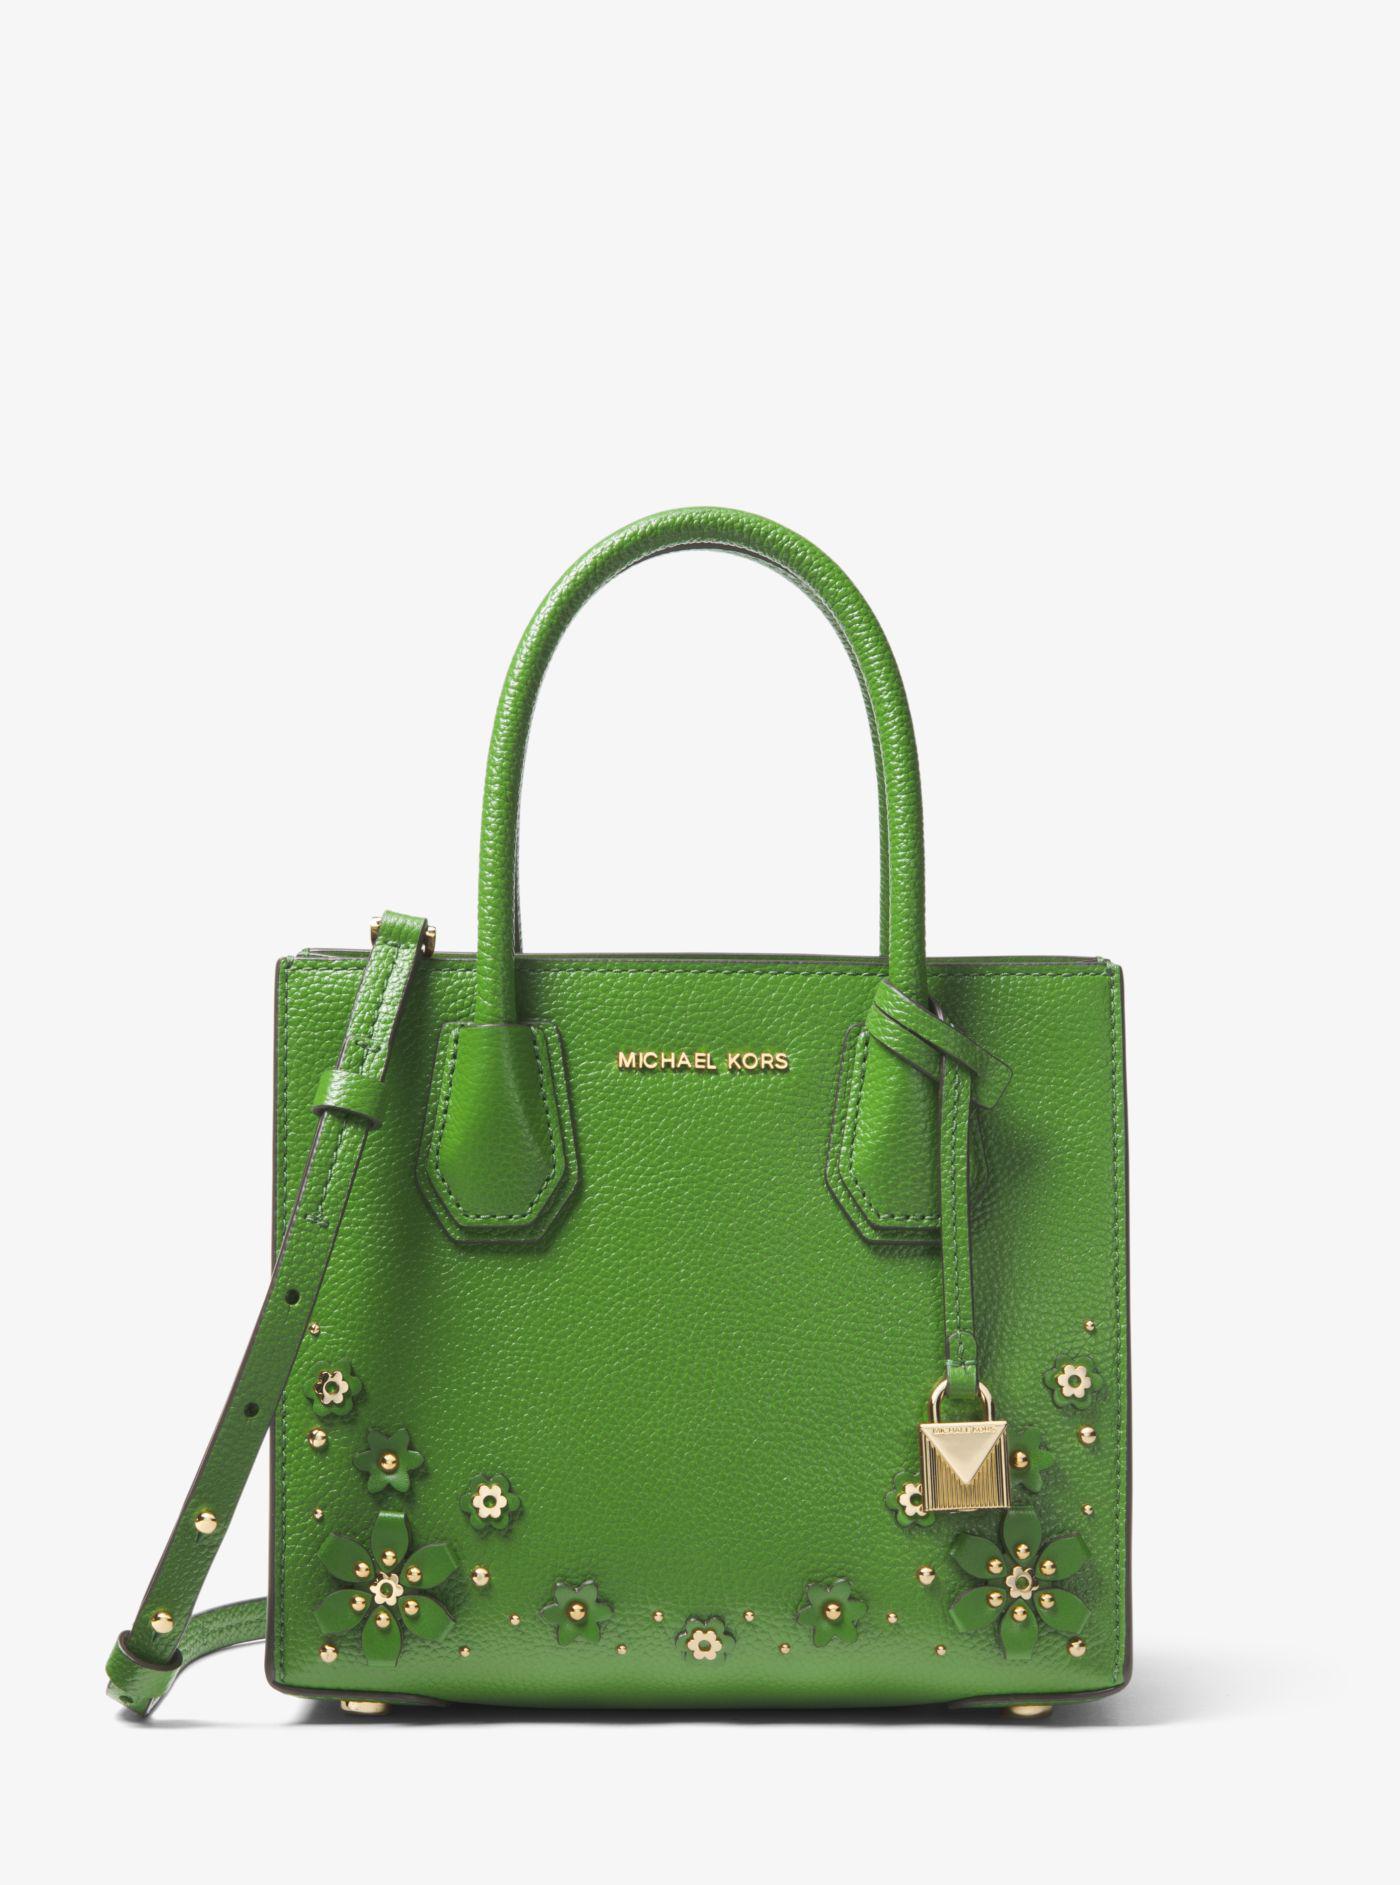 13300dbdf7e1 Lyst - Michael Kors Mercer Floral Embellished Leather Crossbody in Green